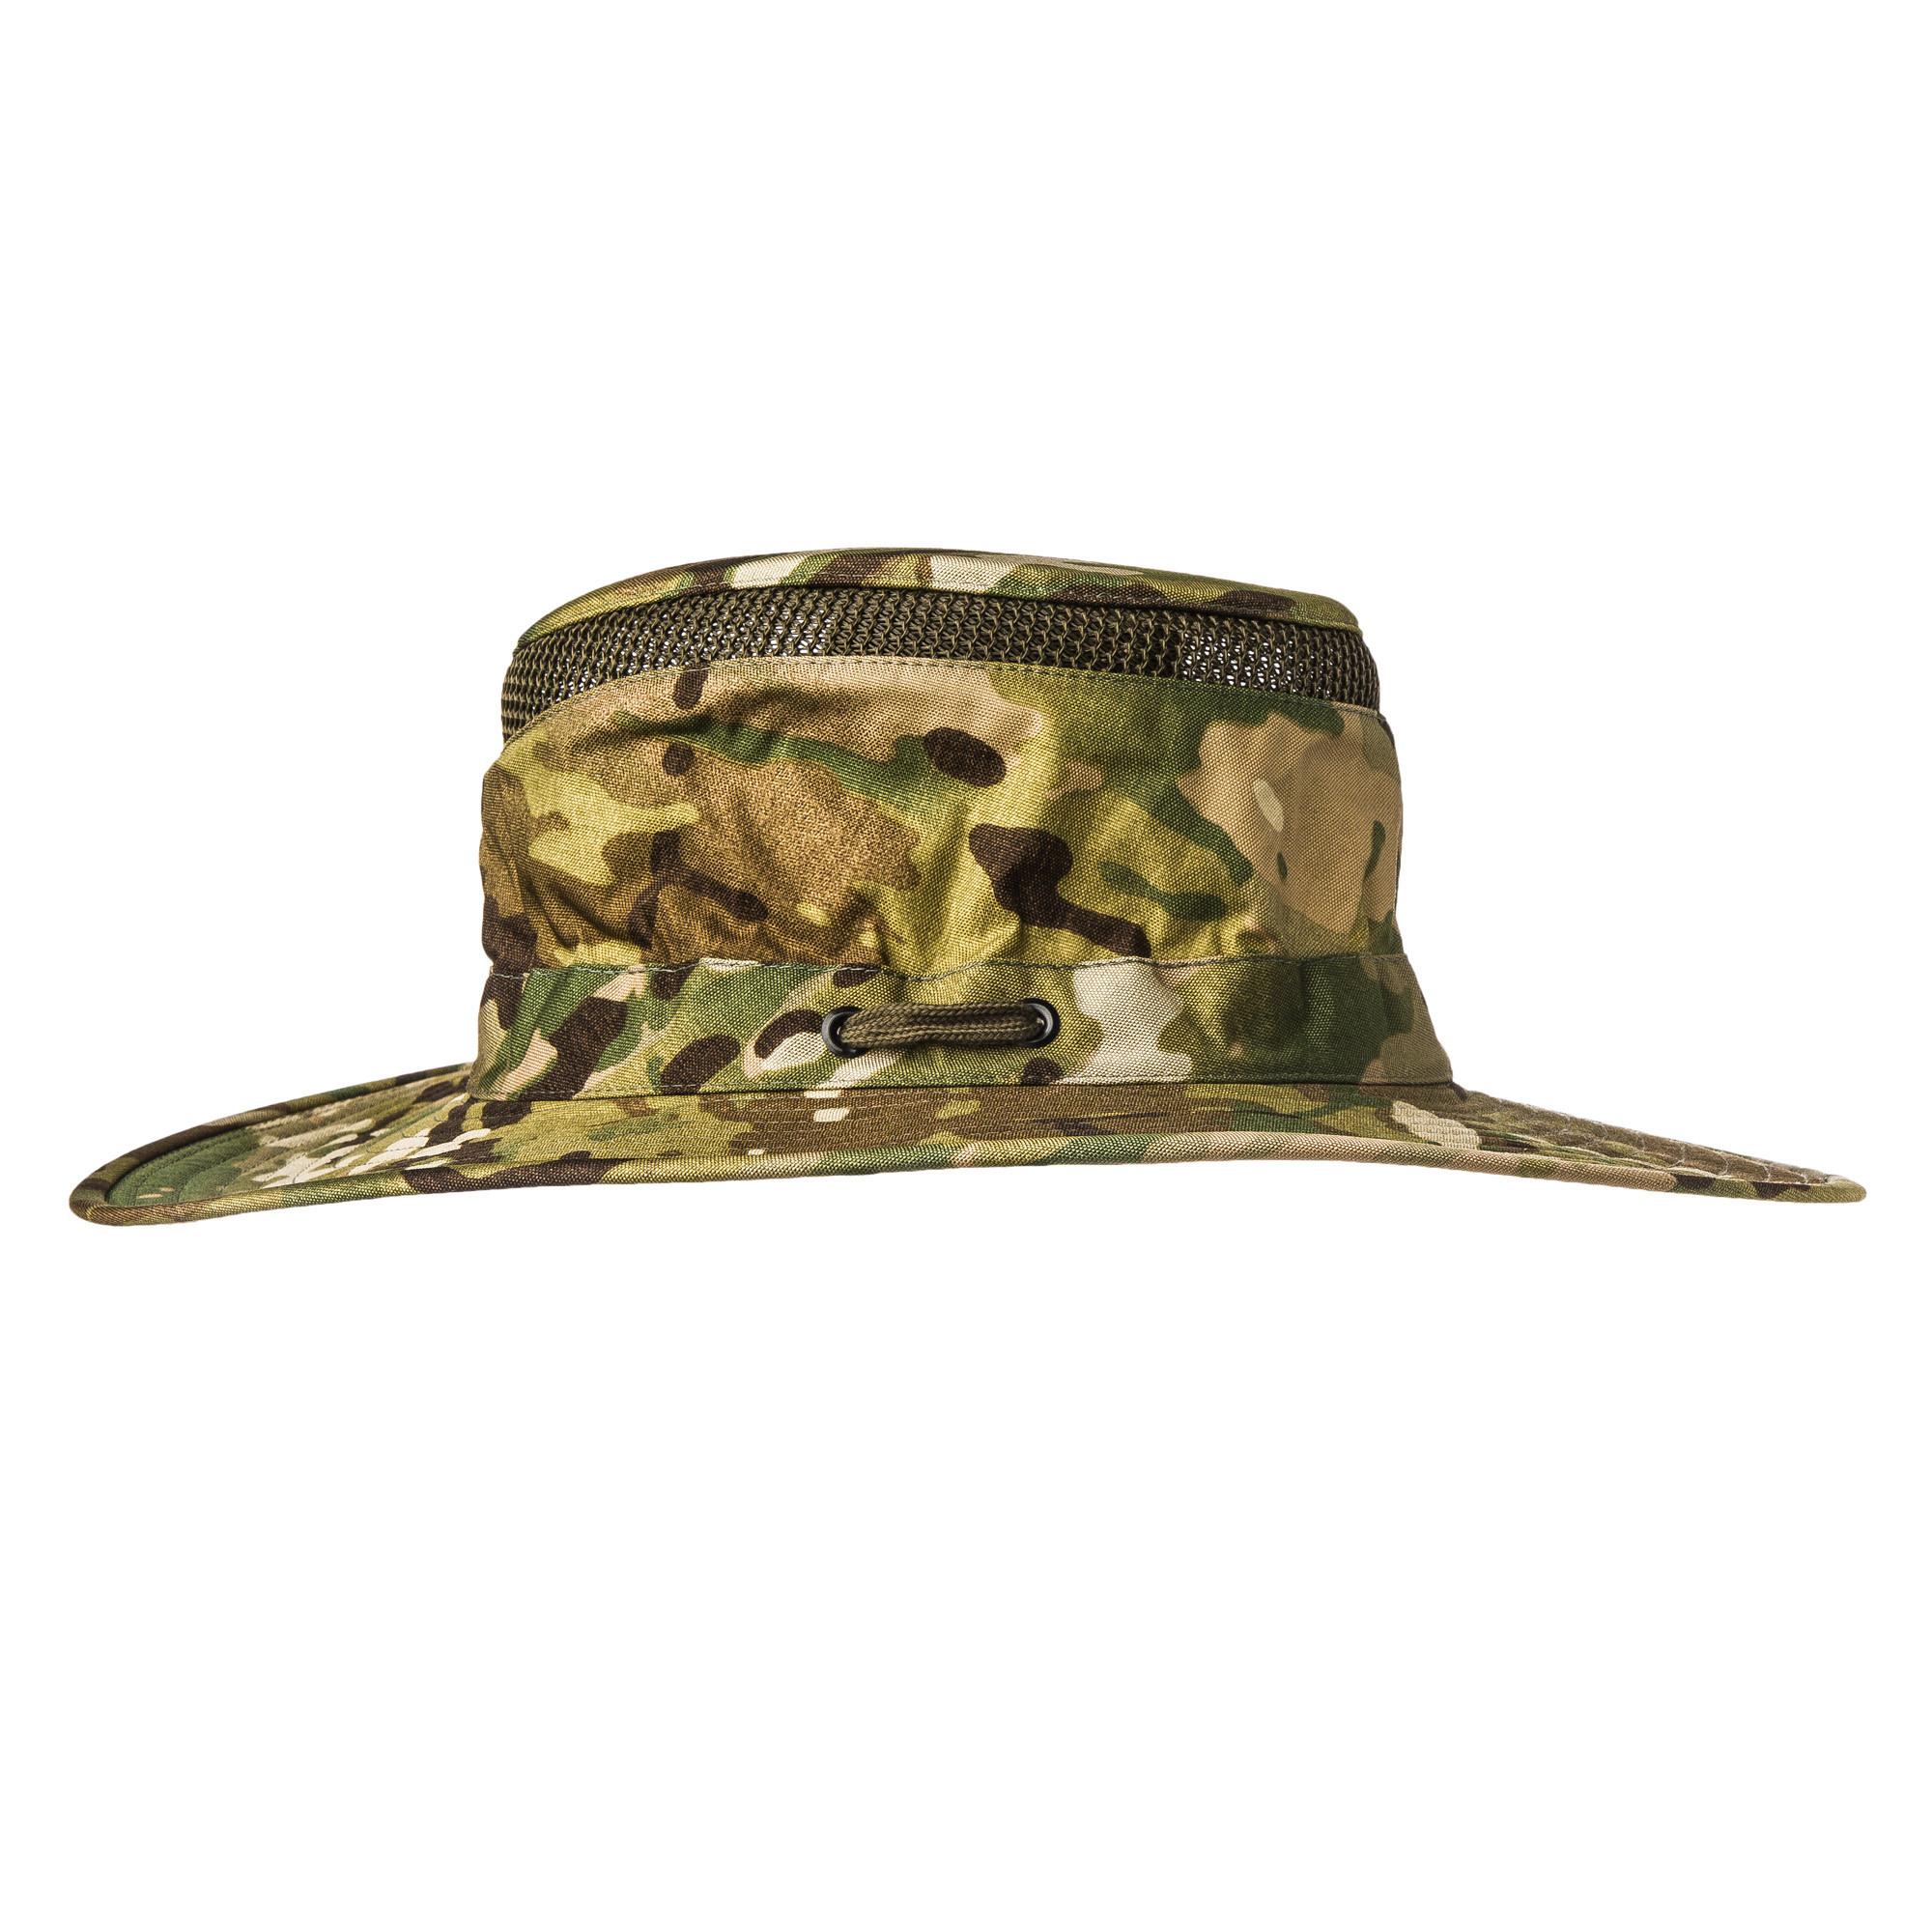 LTM6 Camo Hat LTM6 Camo Hat LTM6 Camo Hat 13f7d862d1d